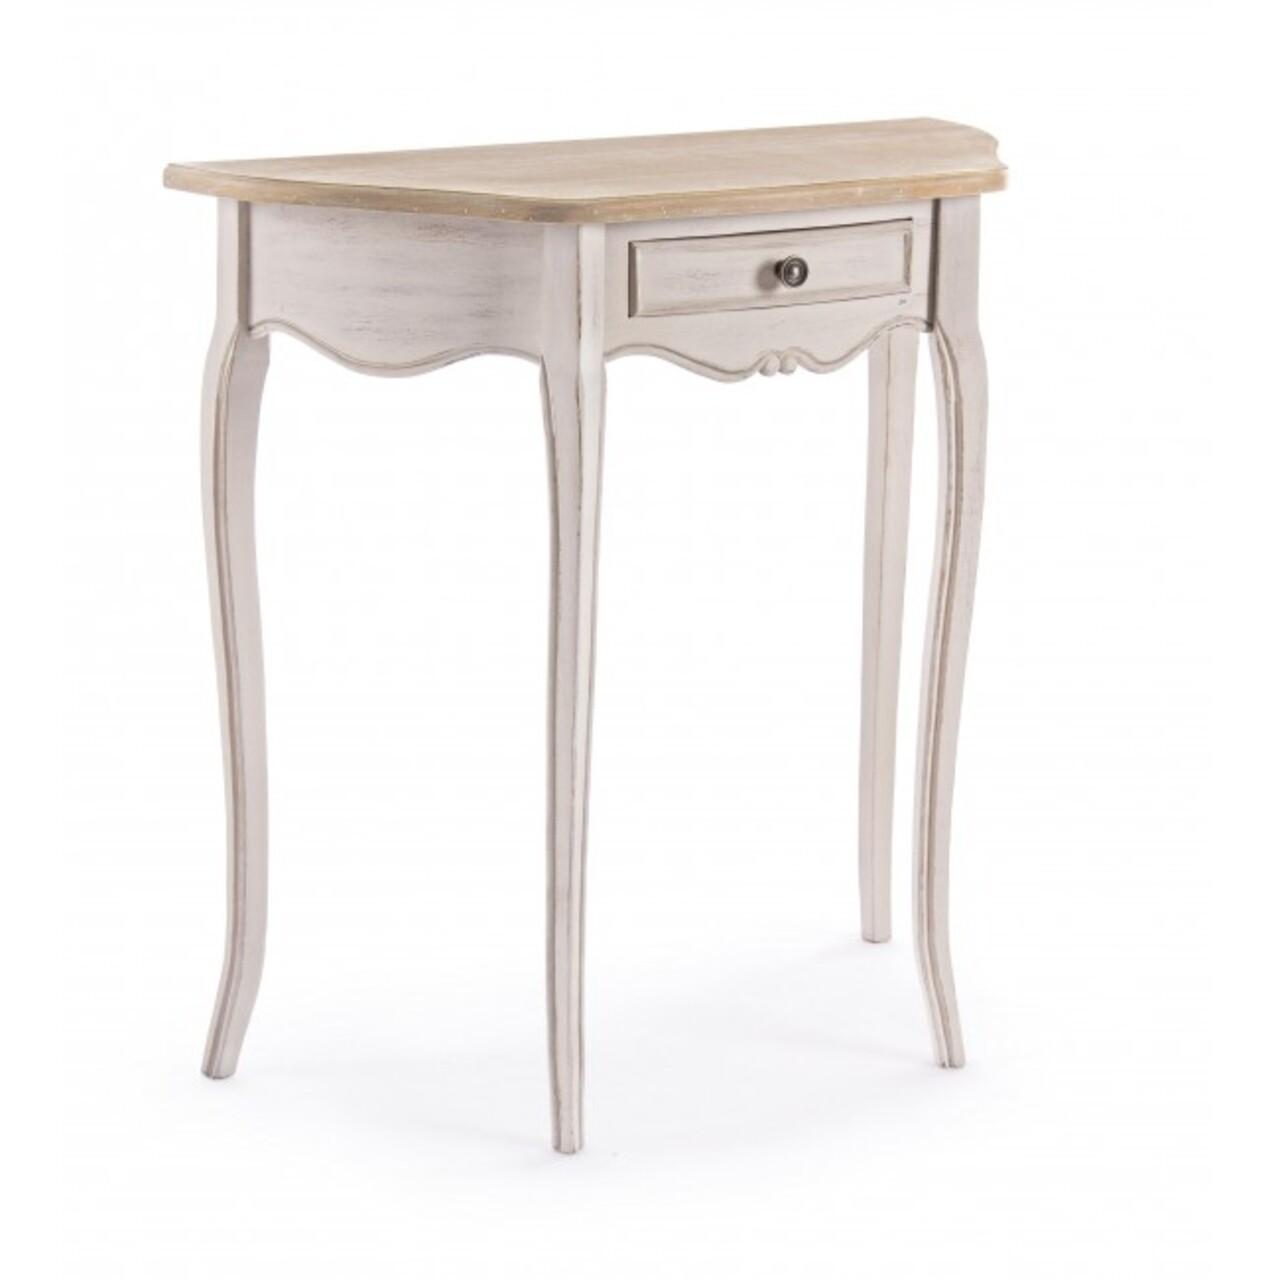 Consola cu 1 sertar, Clarisse, Bizzotto, 80x35x80 cm, lemn de paulownia